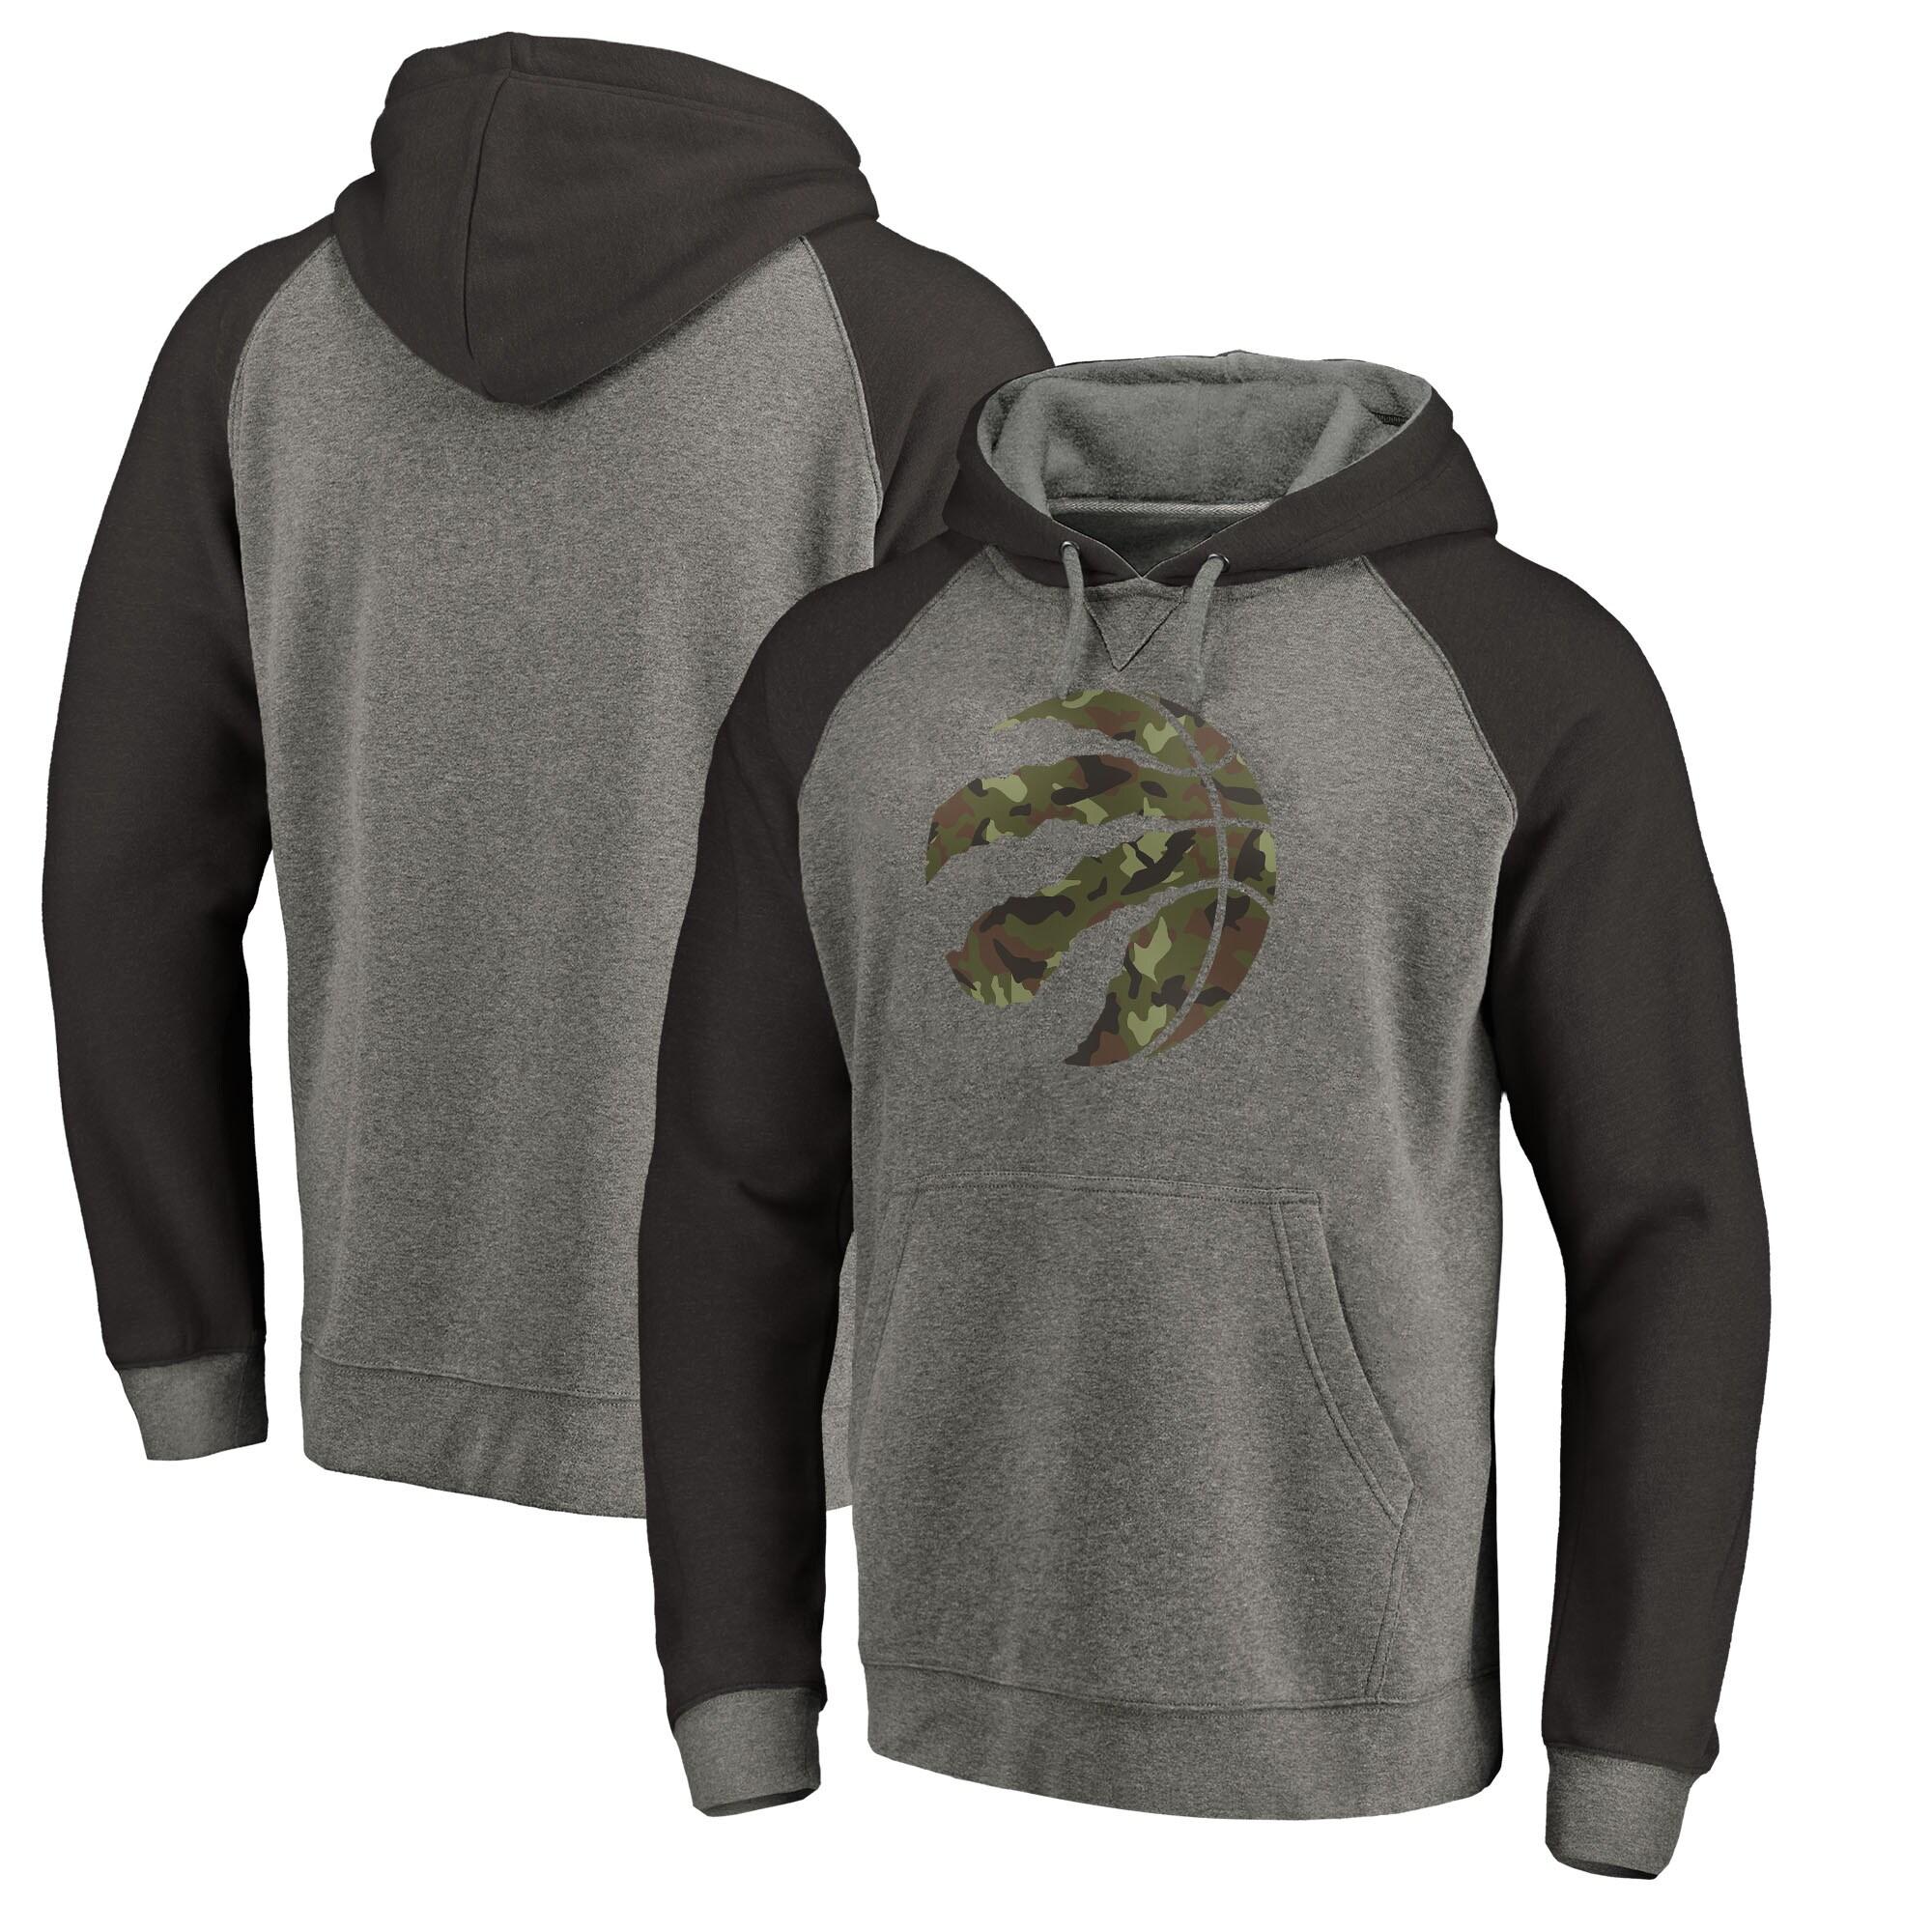 Toronto Raptors Fanatics Branded Prestige Camo Tri-Blend Pullover Hoodie - Heathered Gray